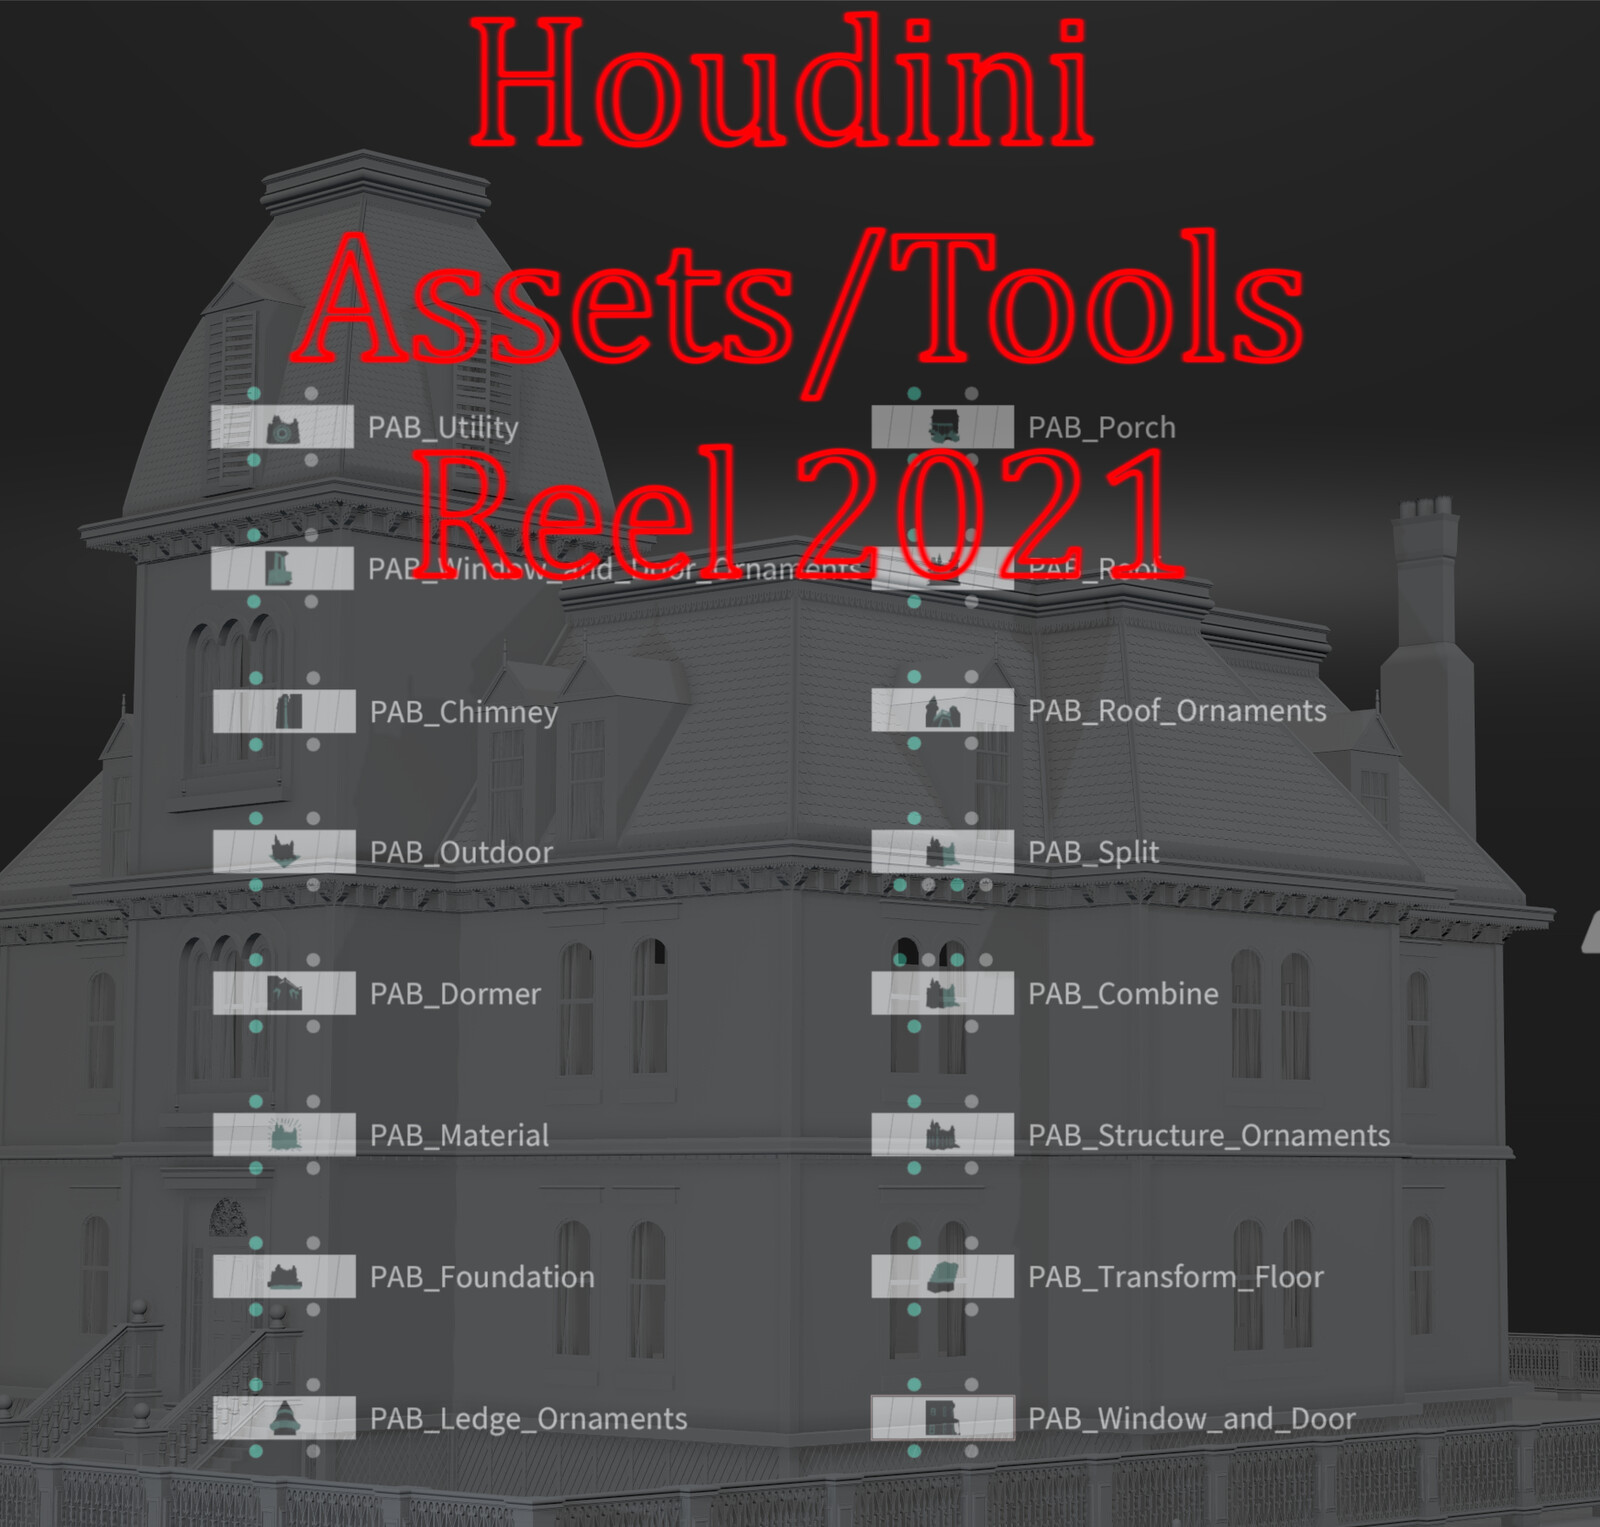 Houdini Assets/Tools Reel 2021